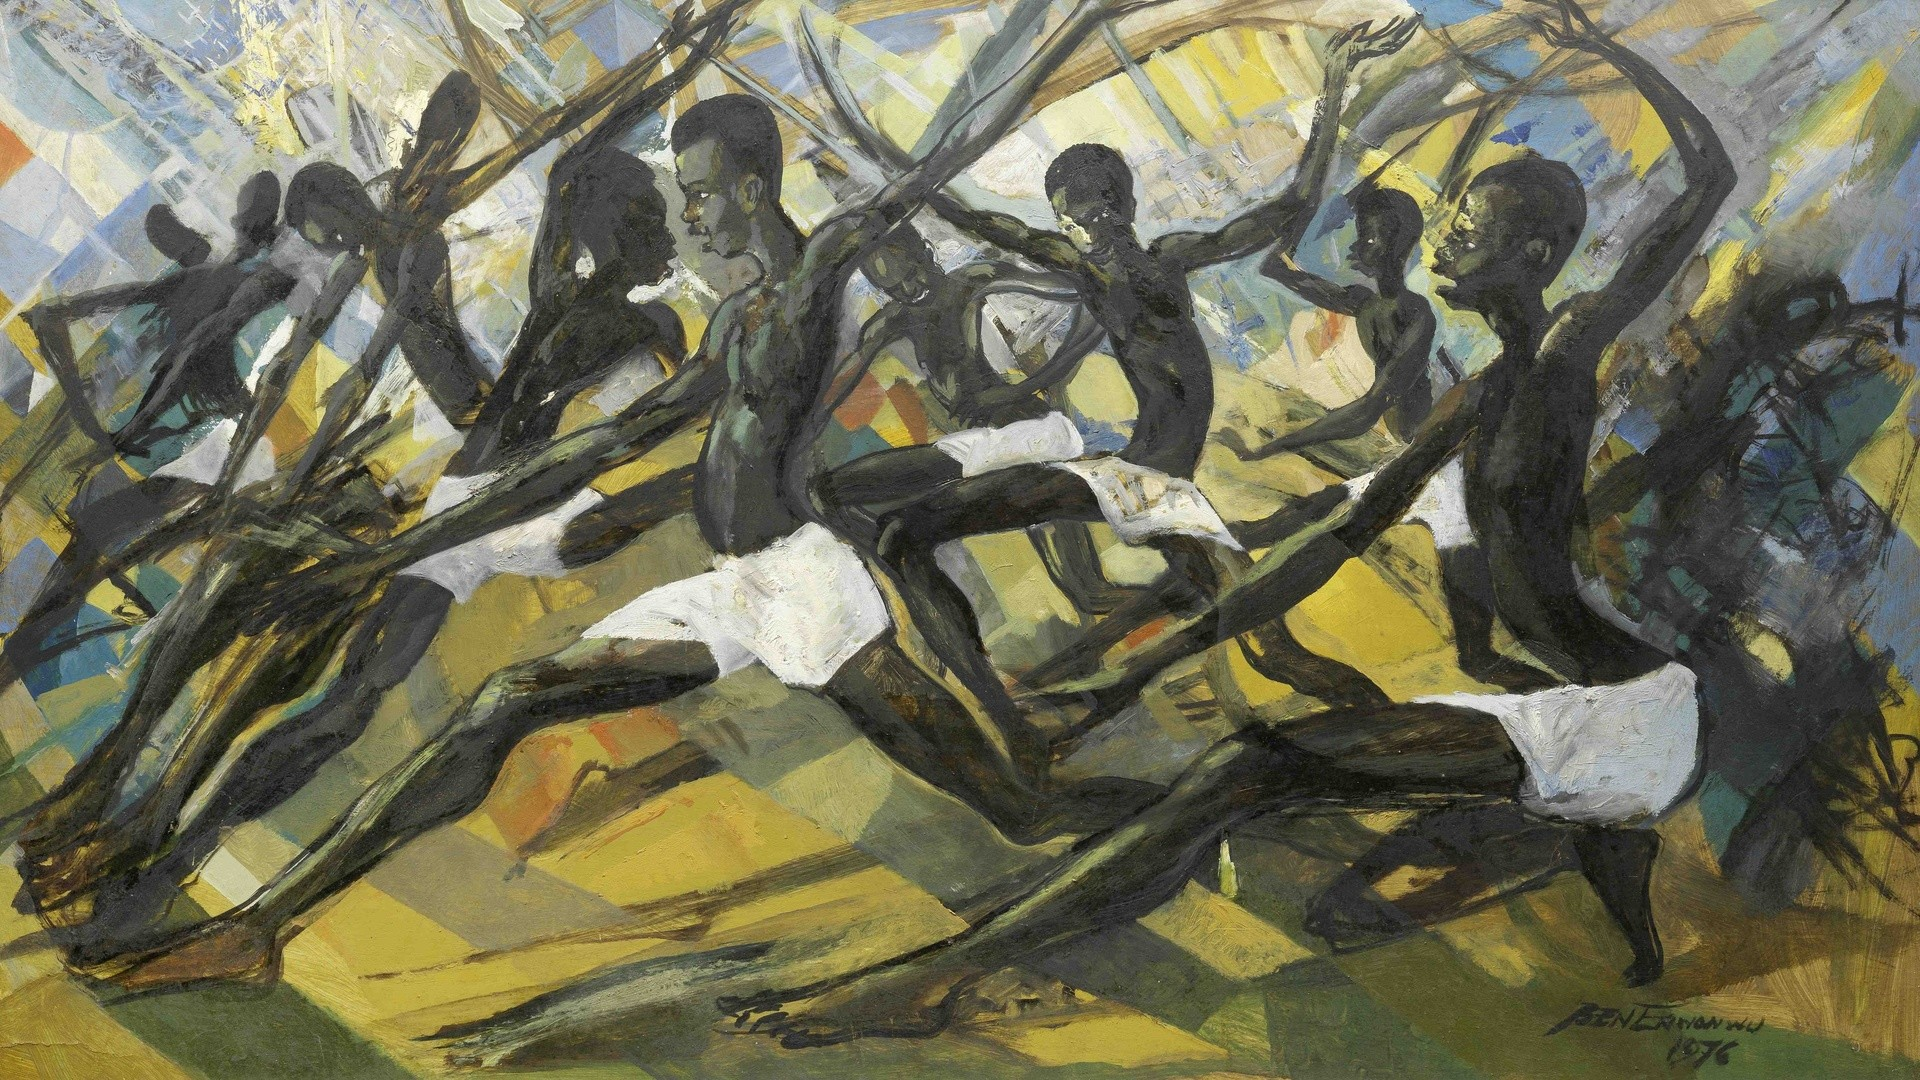 Africa, African Art, Ben Enwonwu, Princes Of Mali, Ben Enwonwu Princes Of